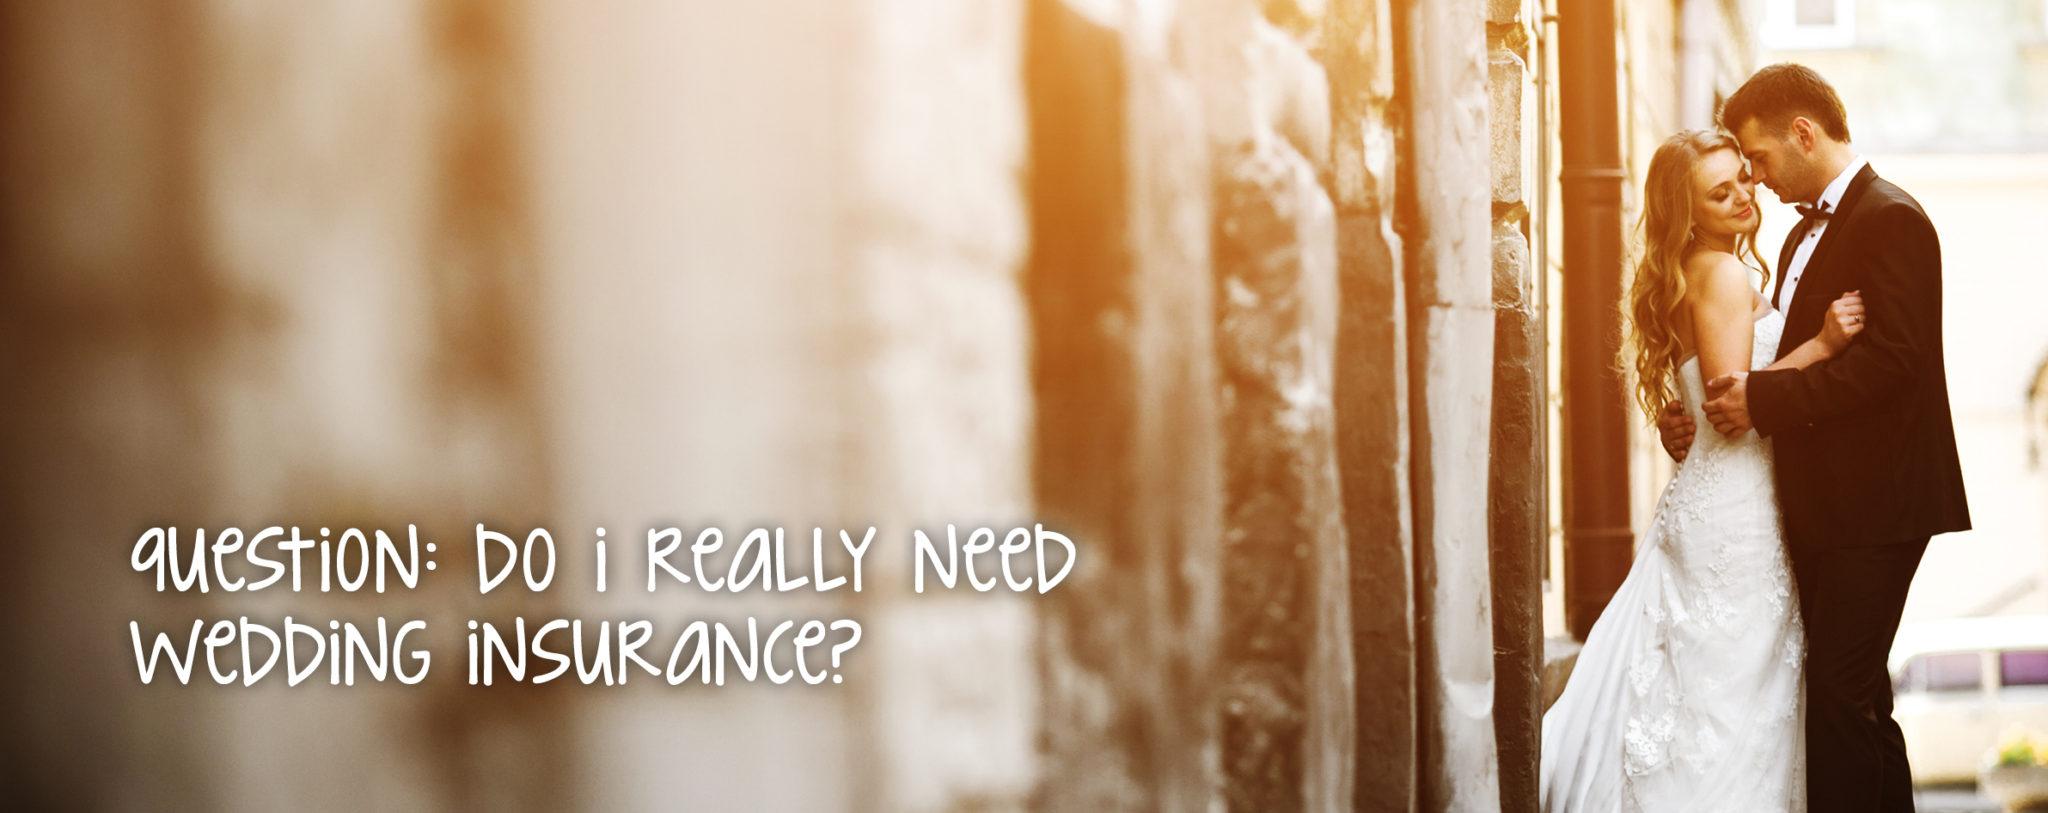 Do You Need Wedding Insurance: Question: Do I Really Need Wedding Insurance?